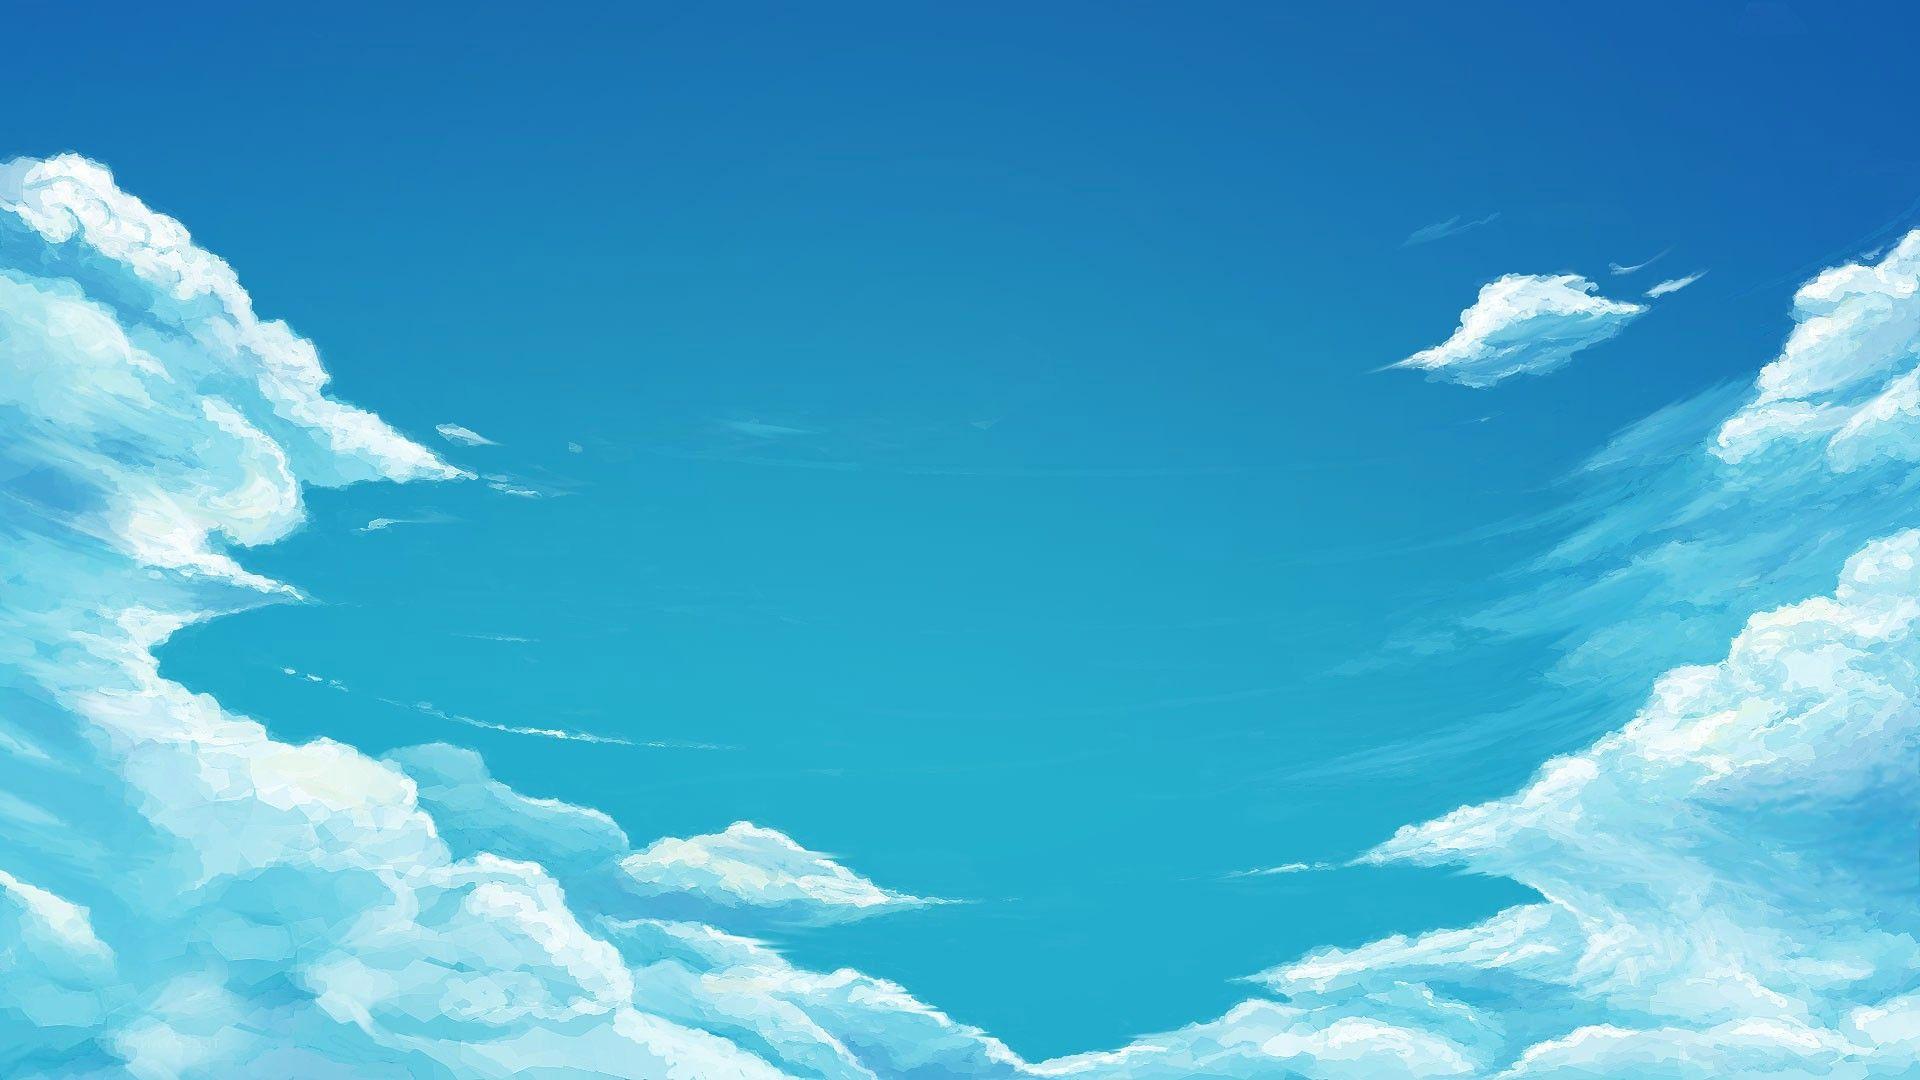 Sky Background Ideas For The House Pinterest Sky Wallpaper